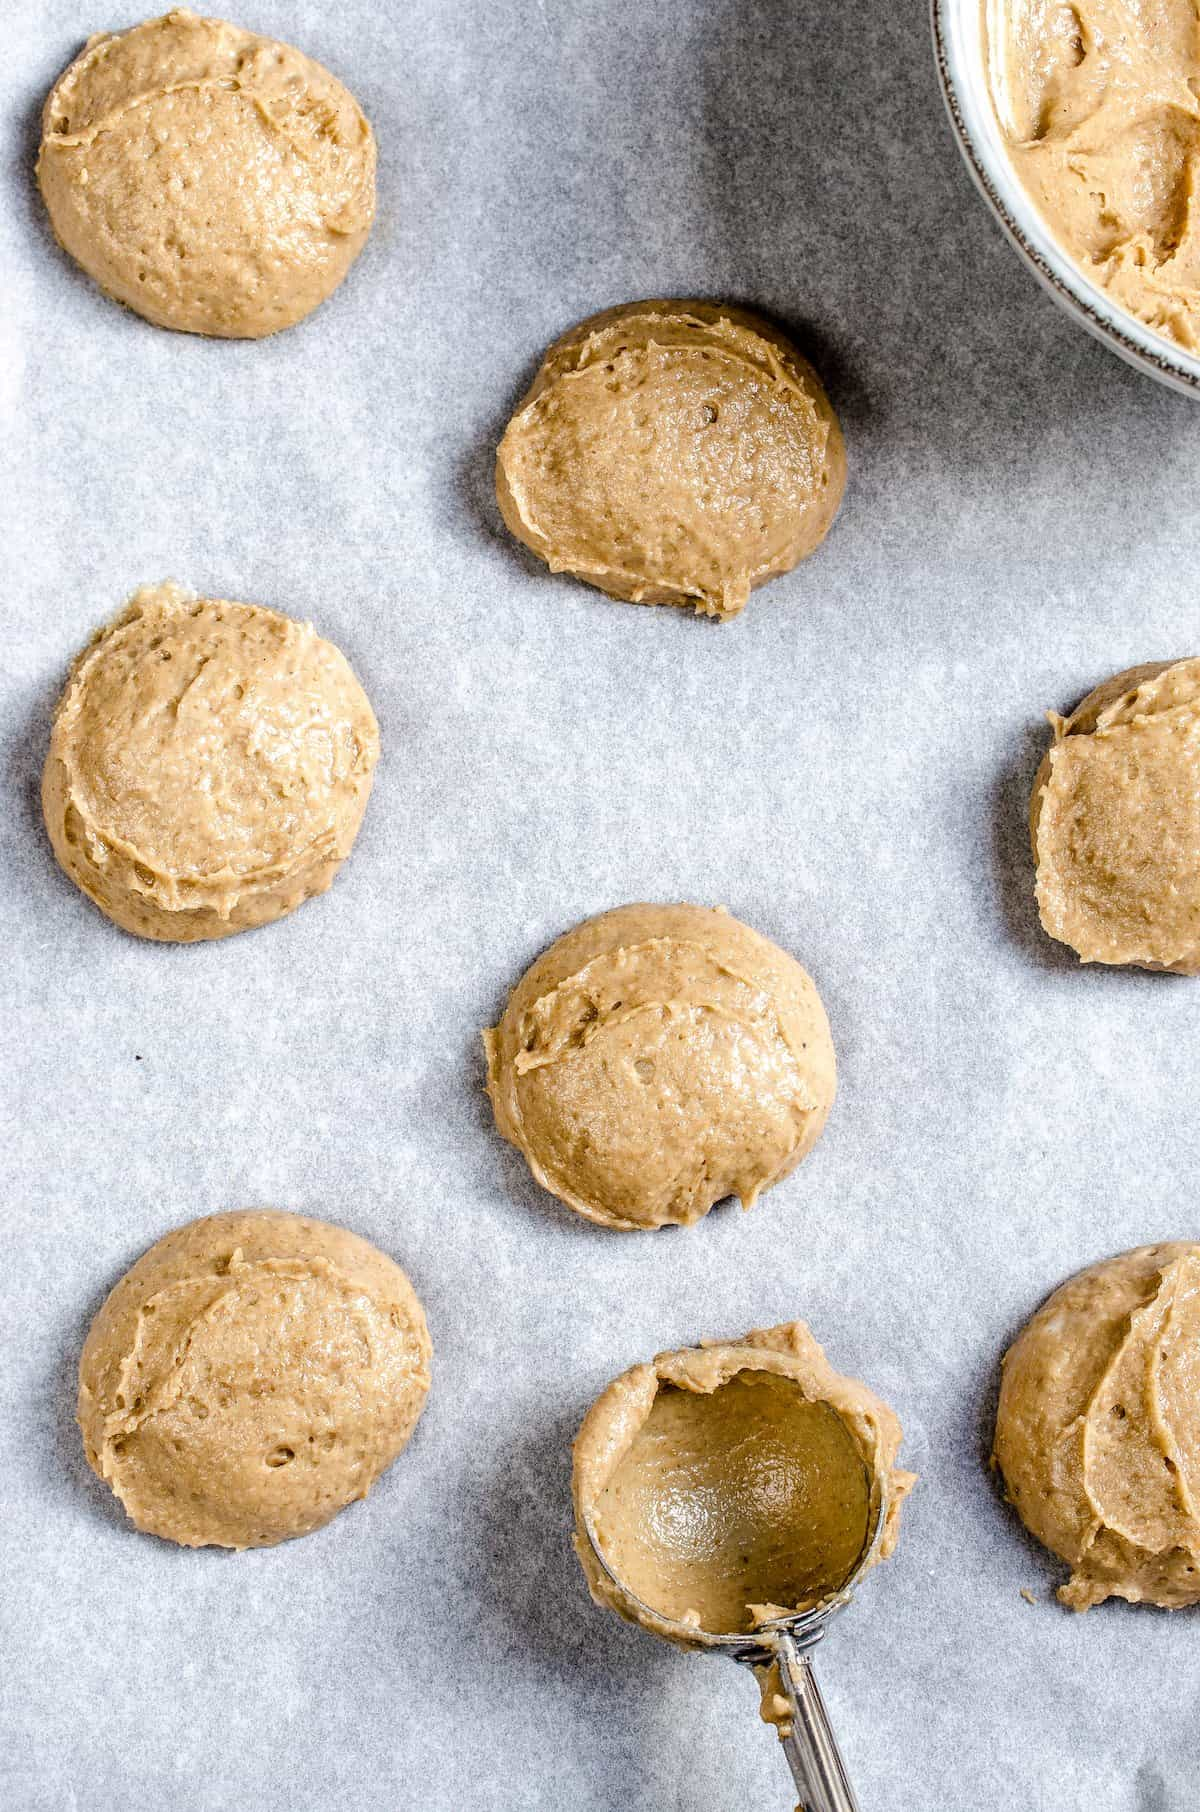 Gingerbread cookie dough on a baking sheet.